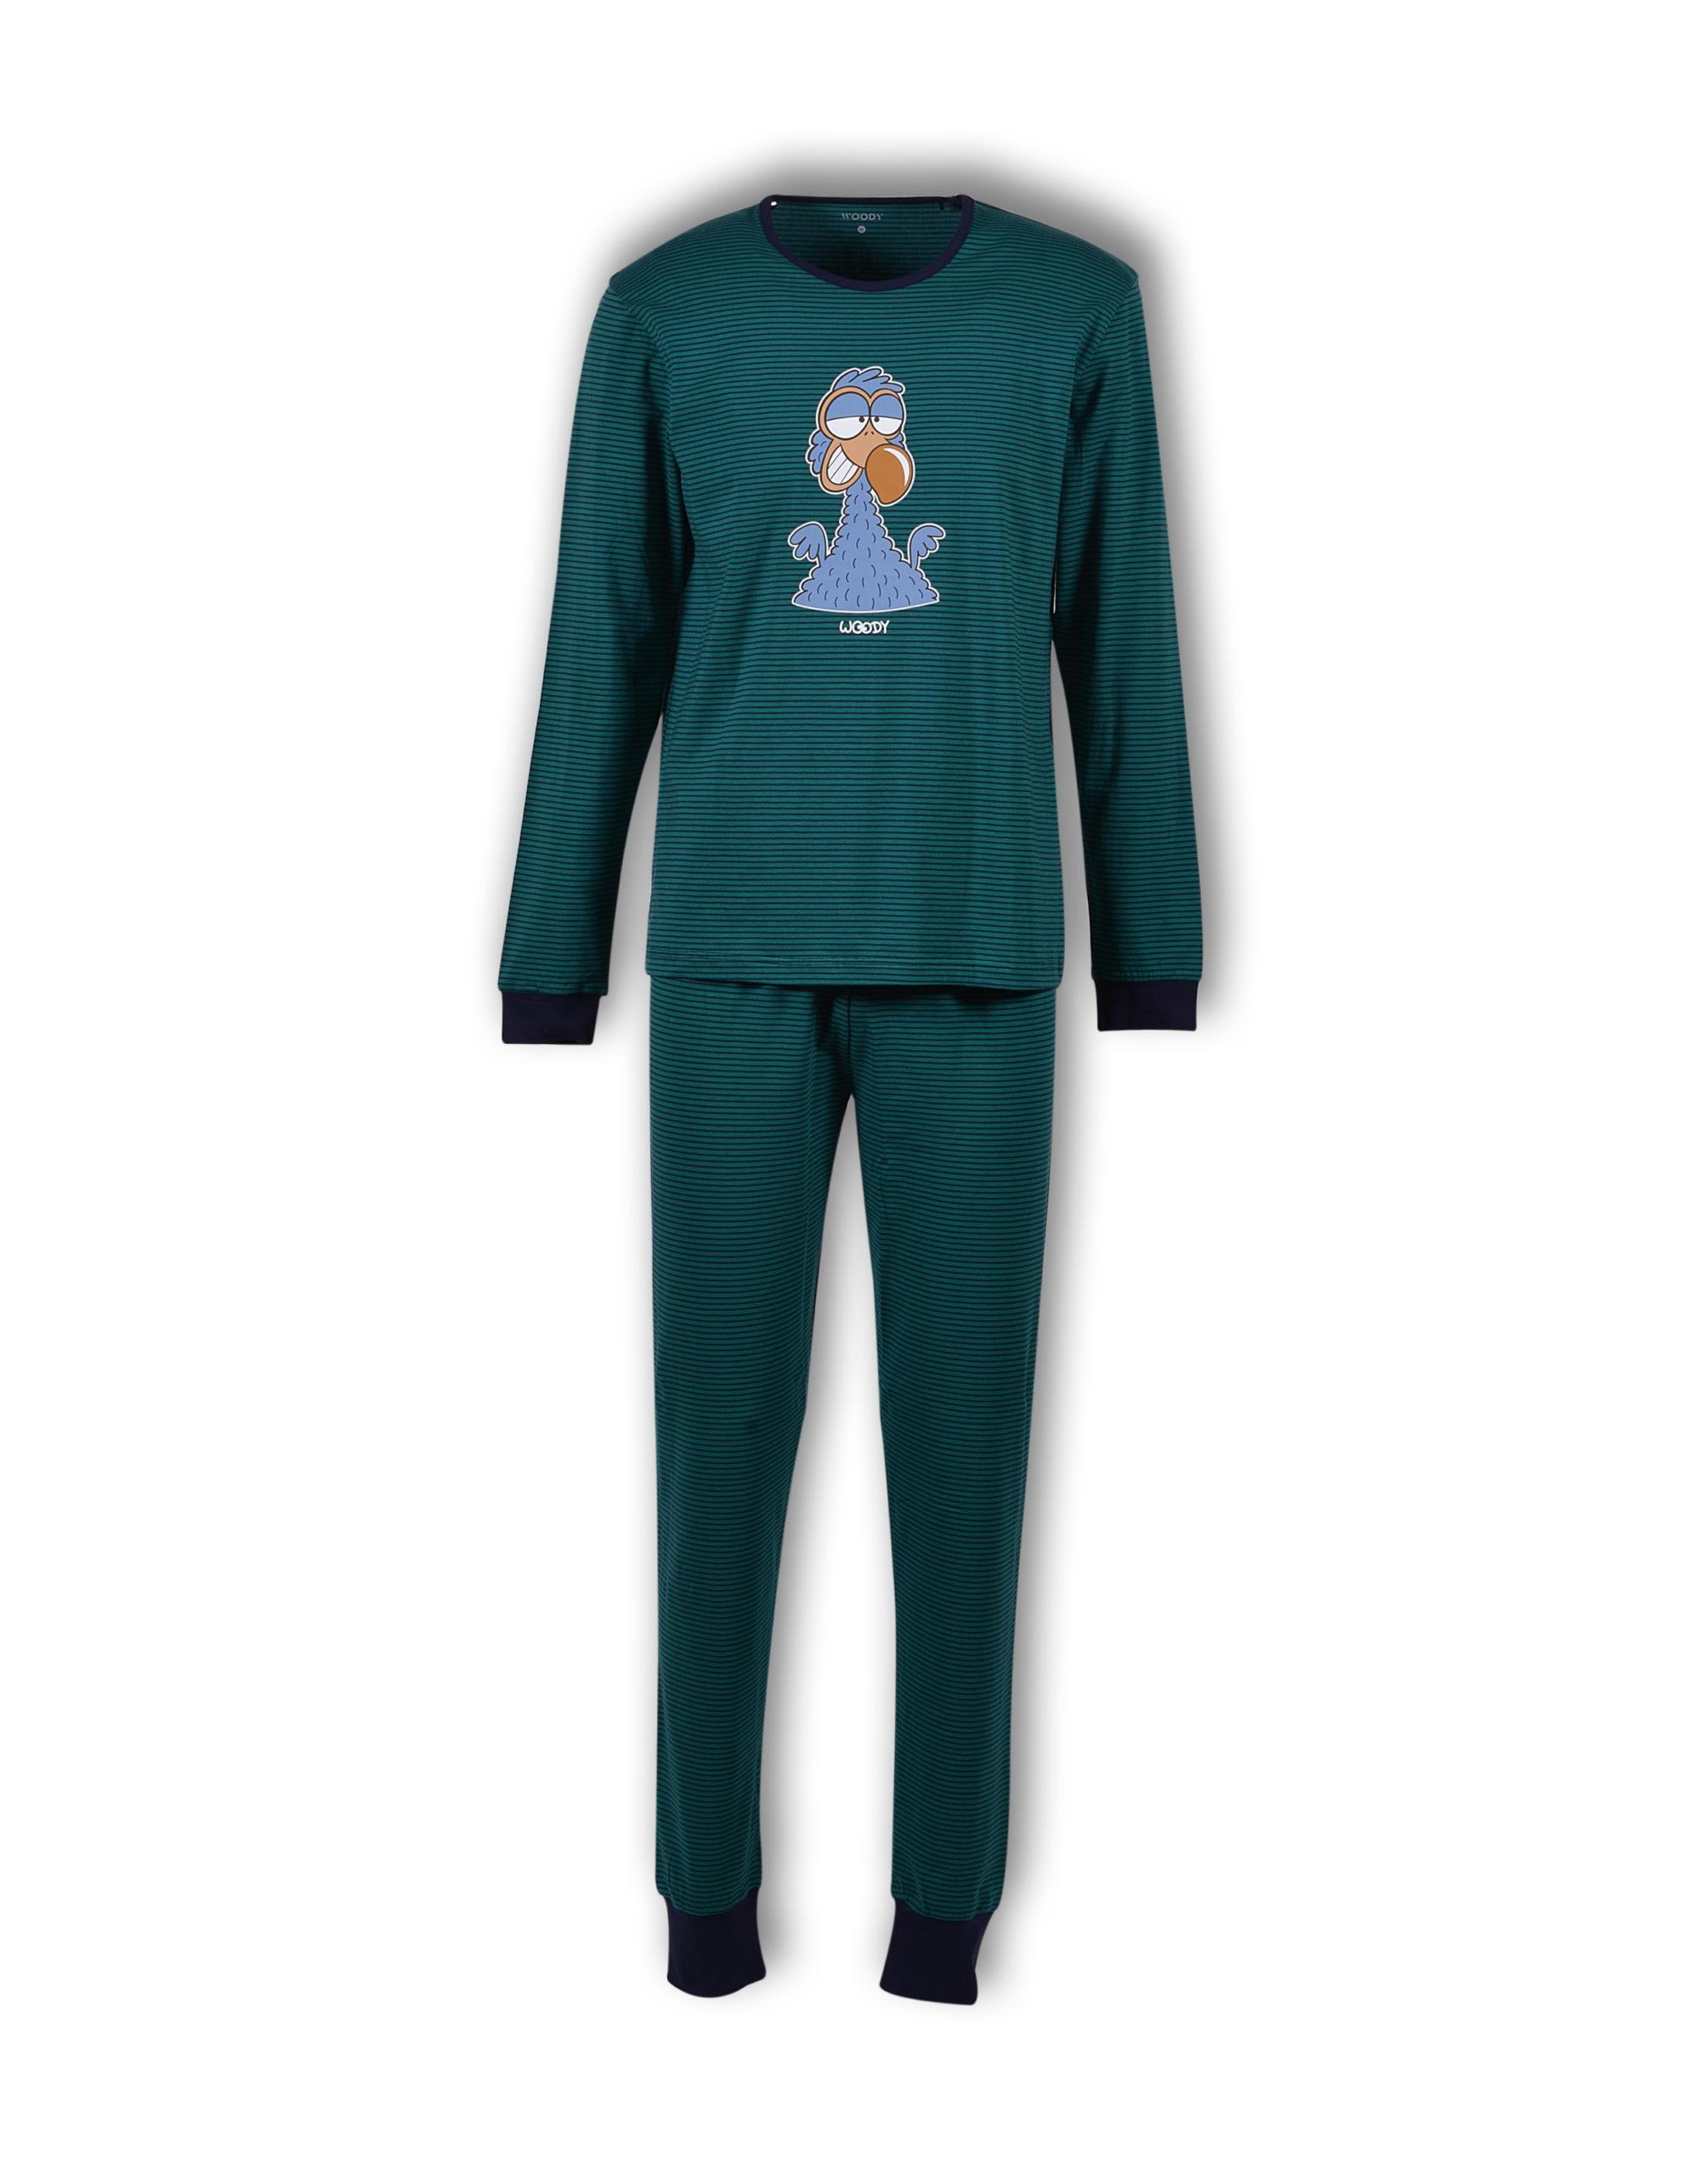 Woody Unisex Pyjama, Gestreept, Dodo